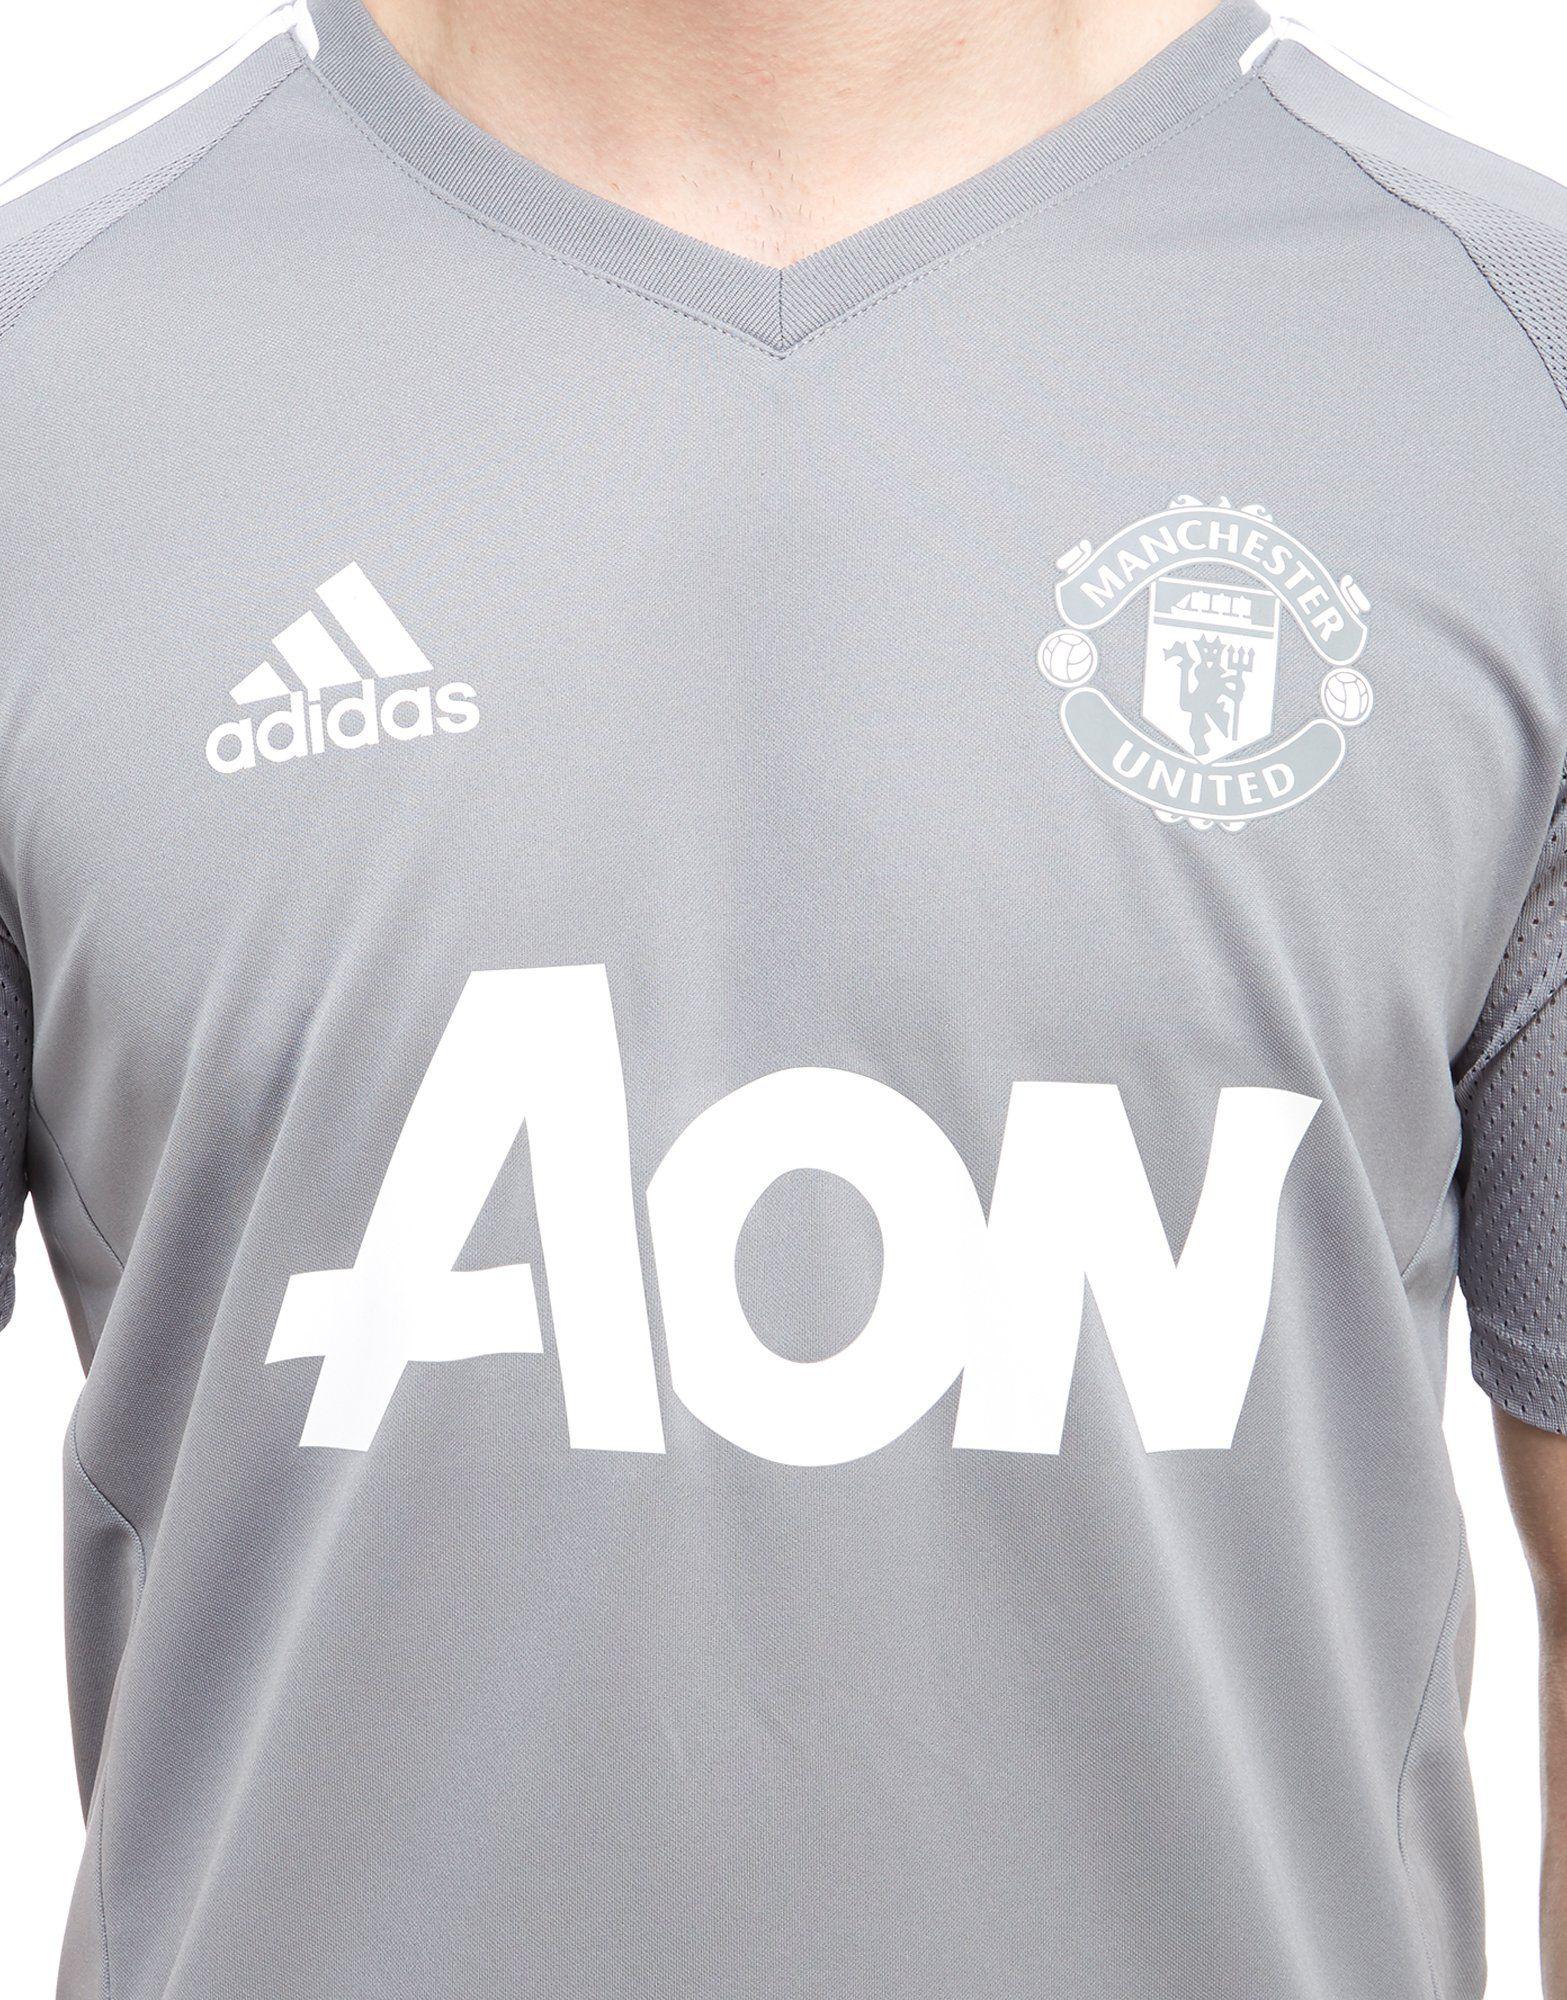 adidas 2017 Manchester Shirt United Grau adidas Training Manchester d1wq4C4